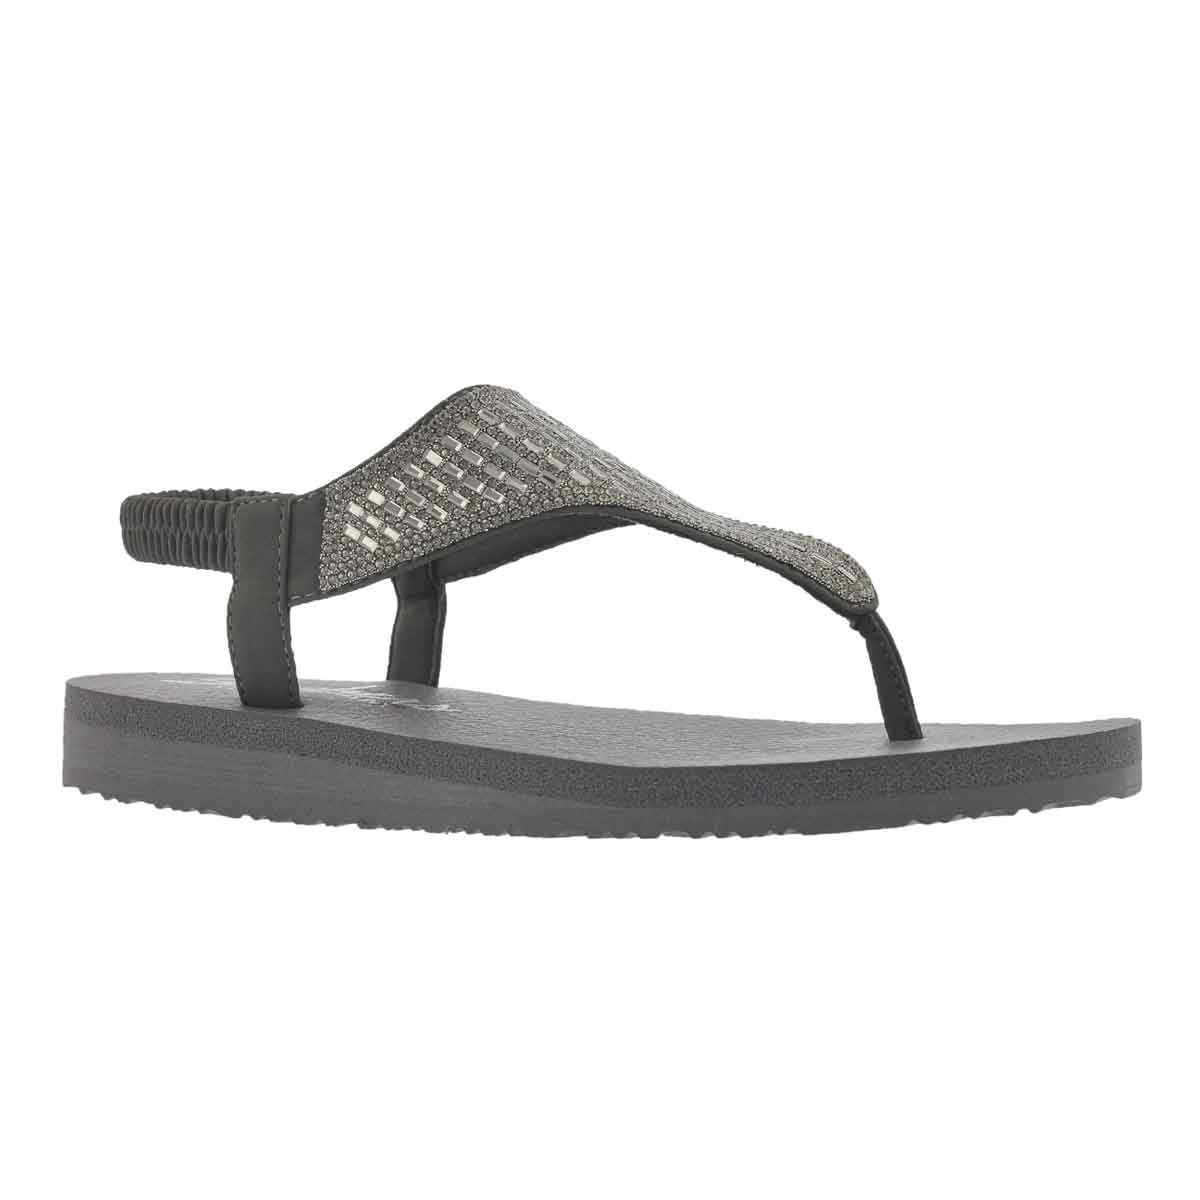 Women's MEDITATION ROCK CROWN charcoal  sandals